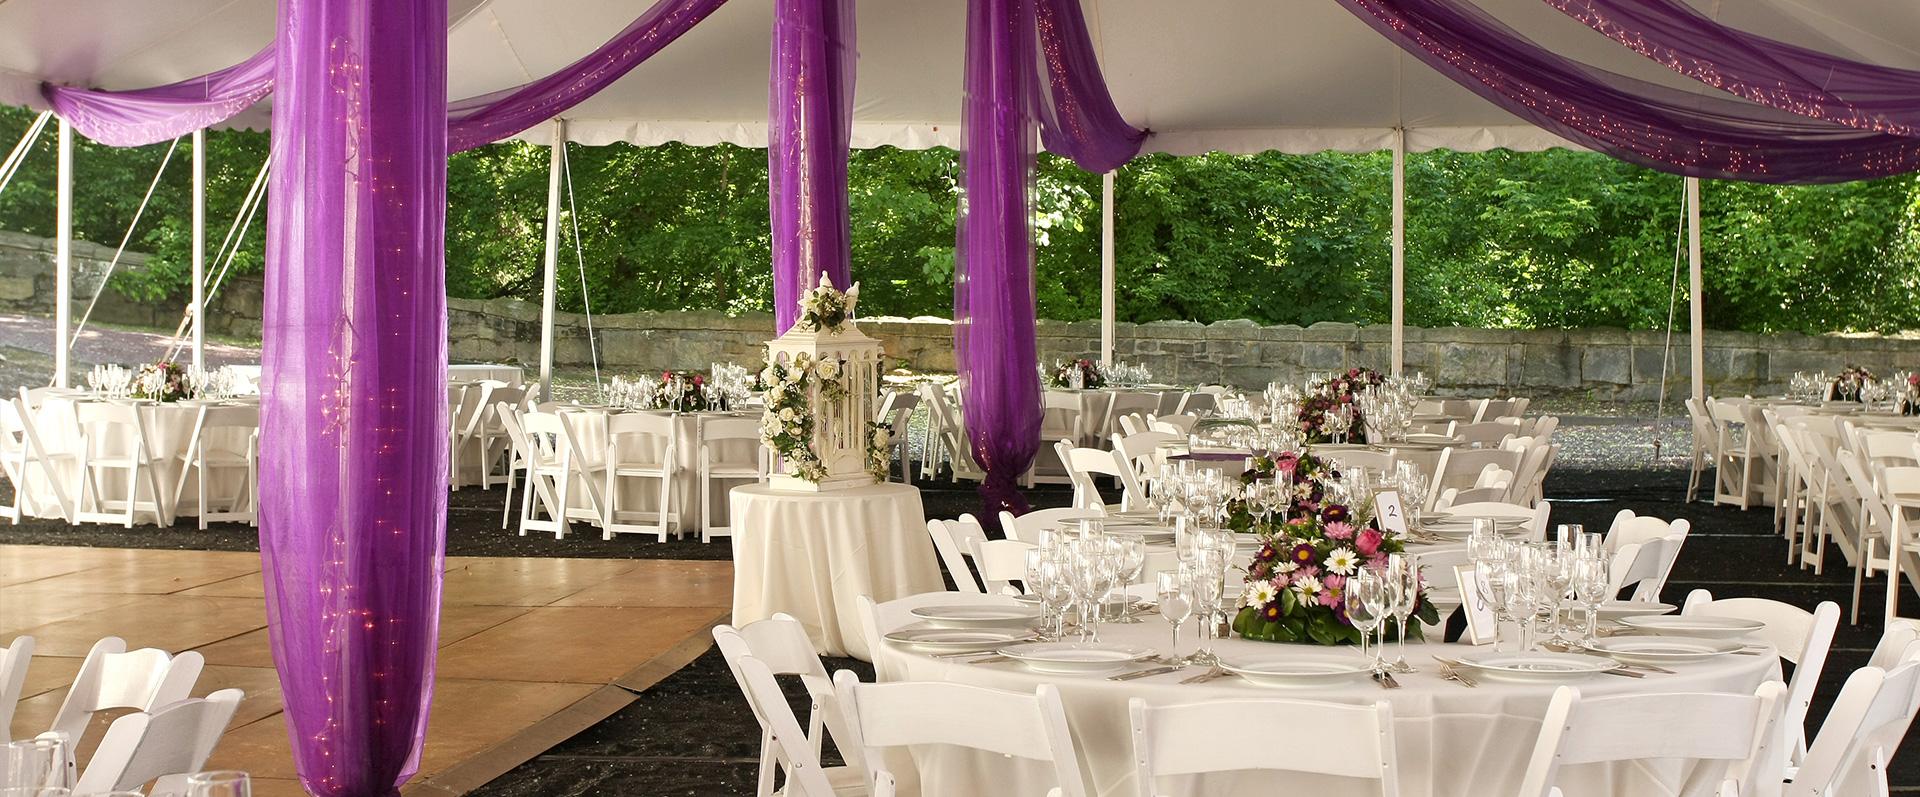 bakospartyrentals wedding decoration rentals Party Tent Rental